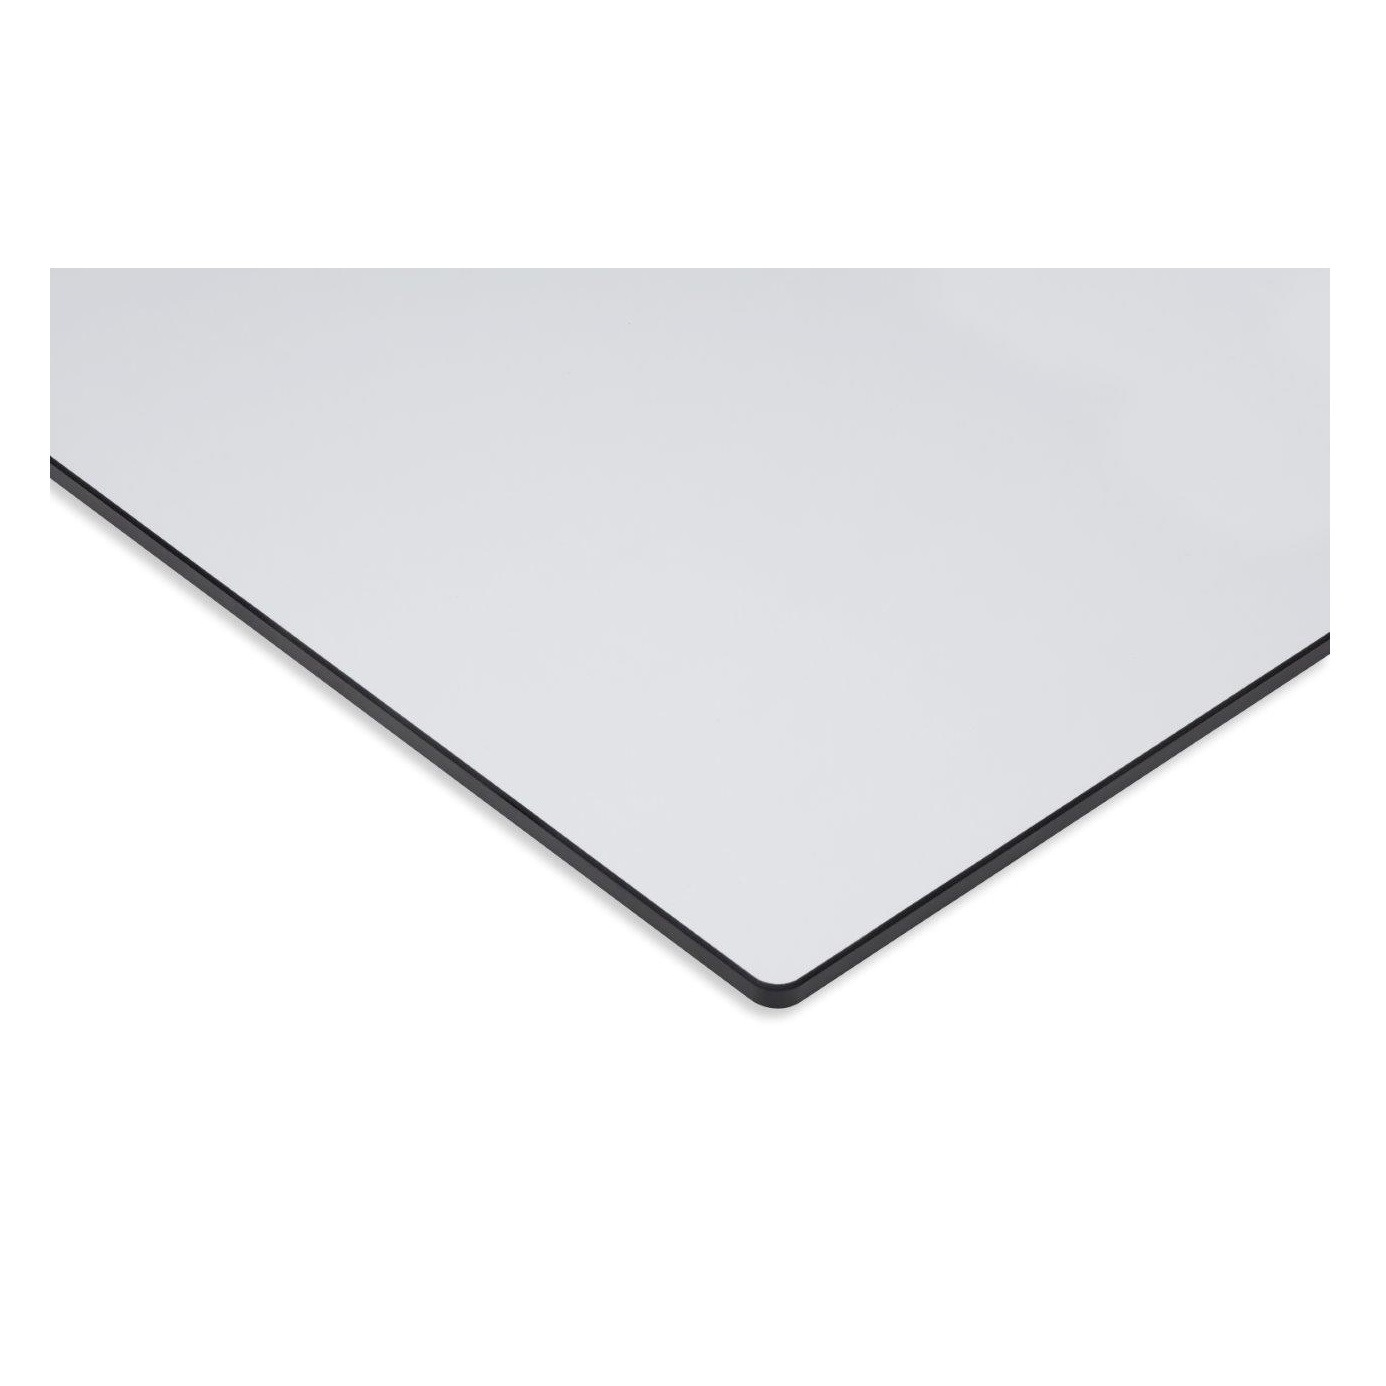 ESD-bordplade, <br/>ESD-kompaktlaminat, <br/>10 mm, 80 x 200 cm